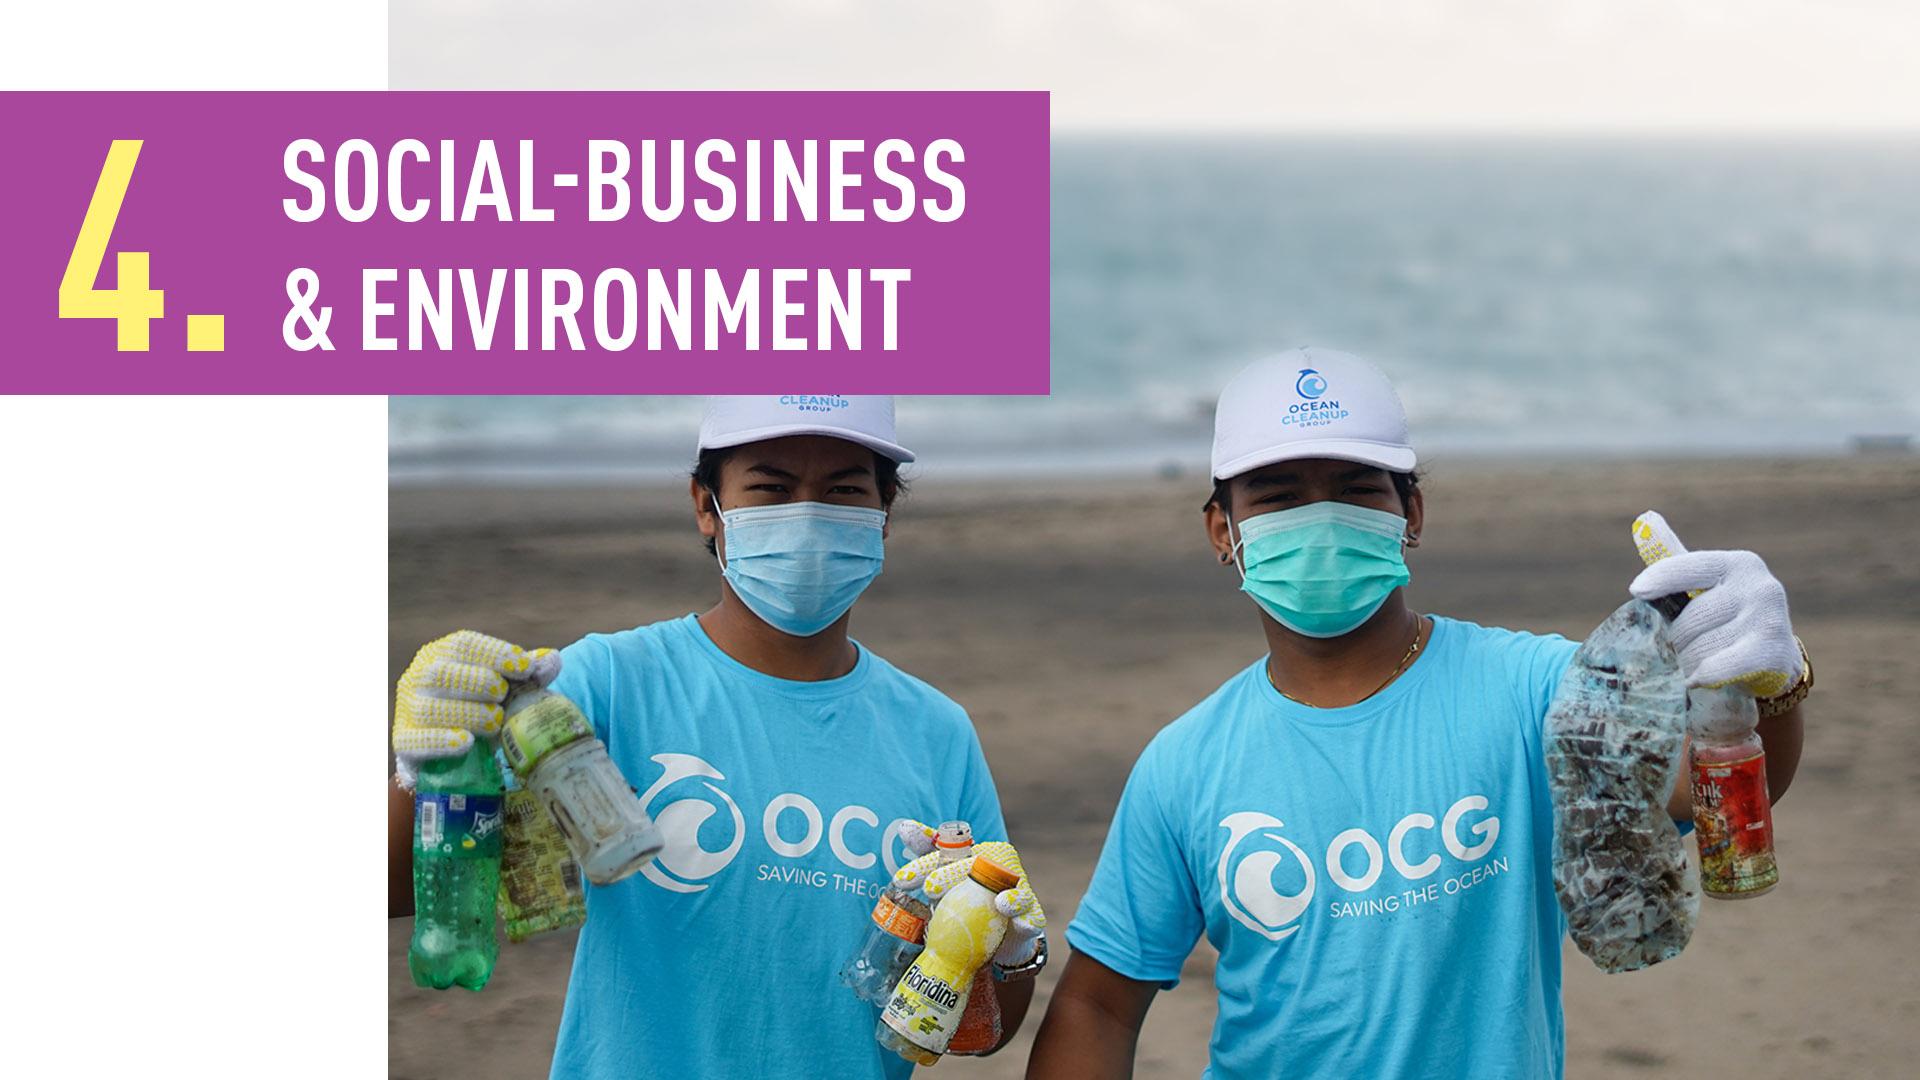 SOCIAL-BUSINESS & ENVIRONMENT